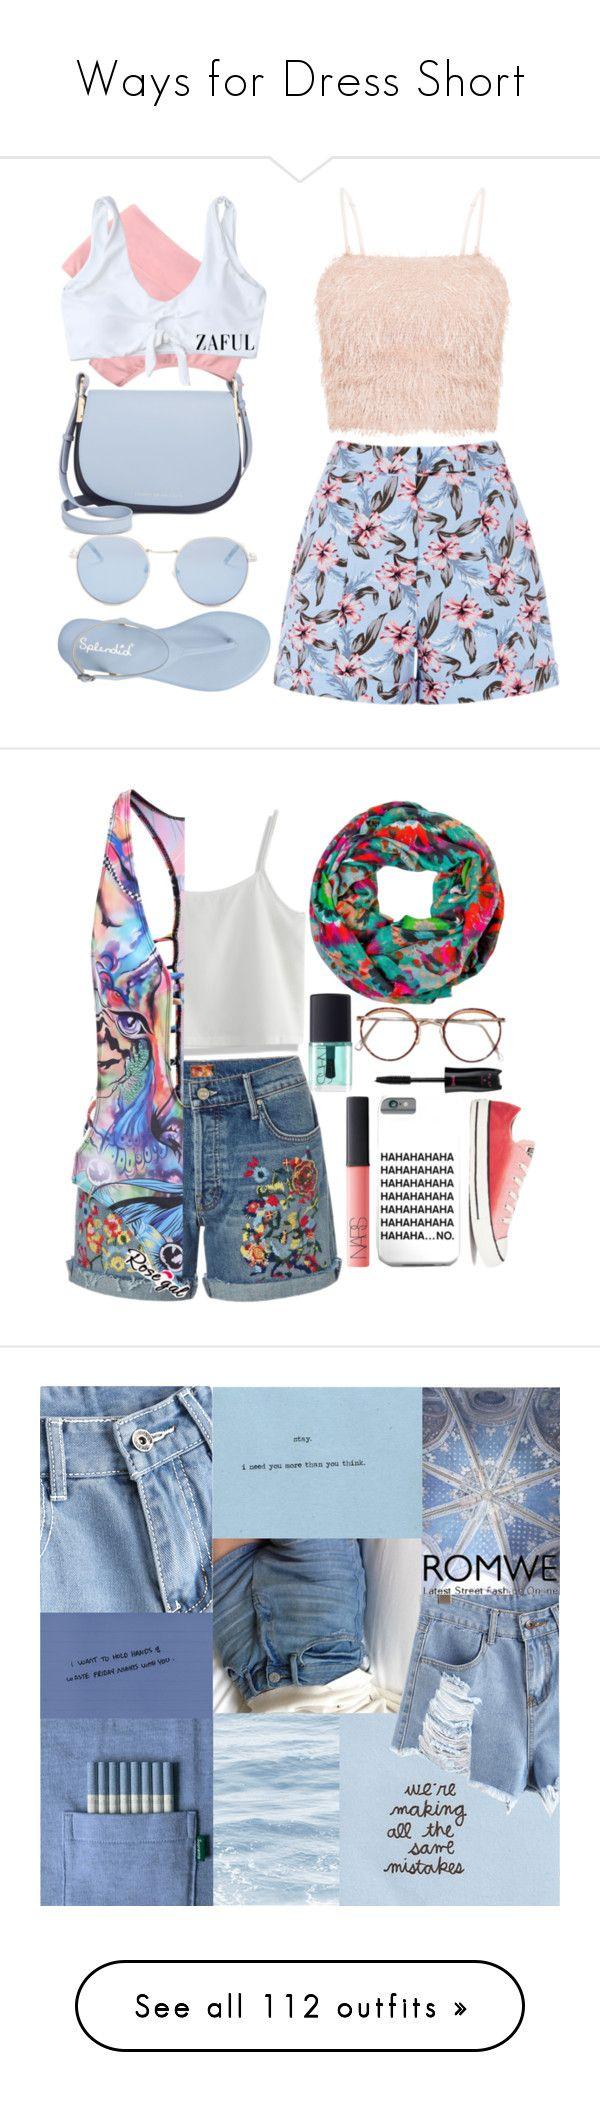 """Ways for Dress Short"" by varrica ❤ liked on Polyvore featuring Badgley Mischka, Tommy Hilfiger, Wildfox, bikini, zaful, Chicwish, NARS Cosmetics, Converse, Pull&Bear and Fujifilm"